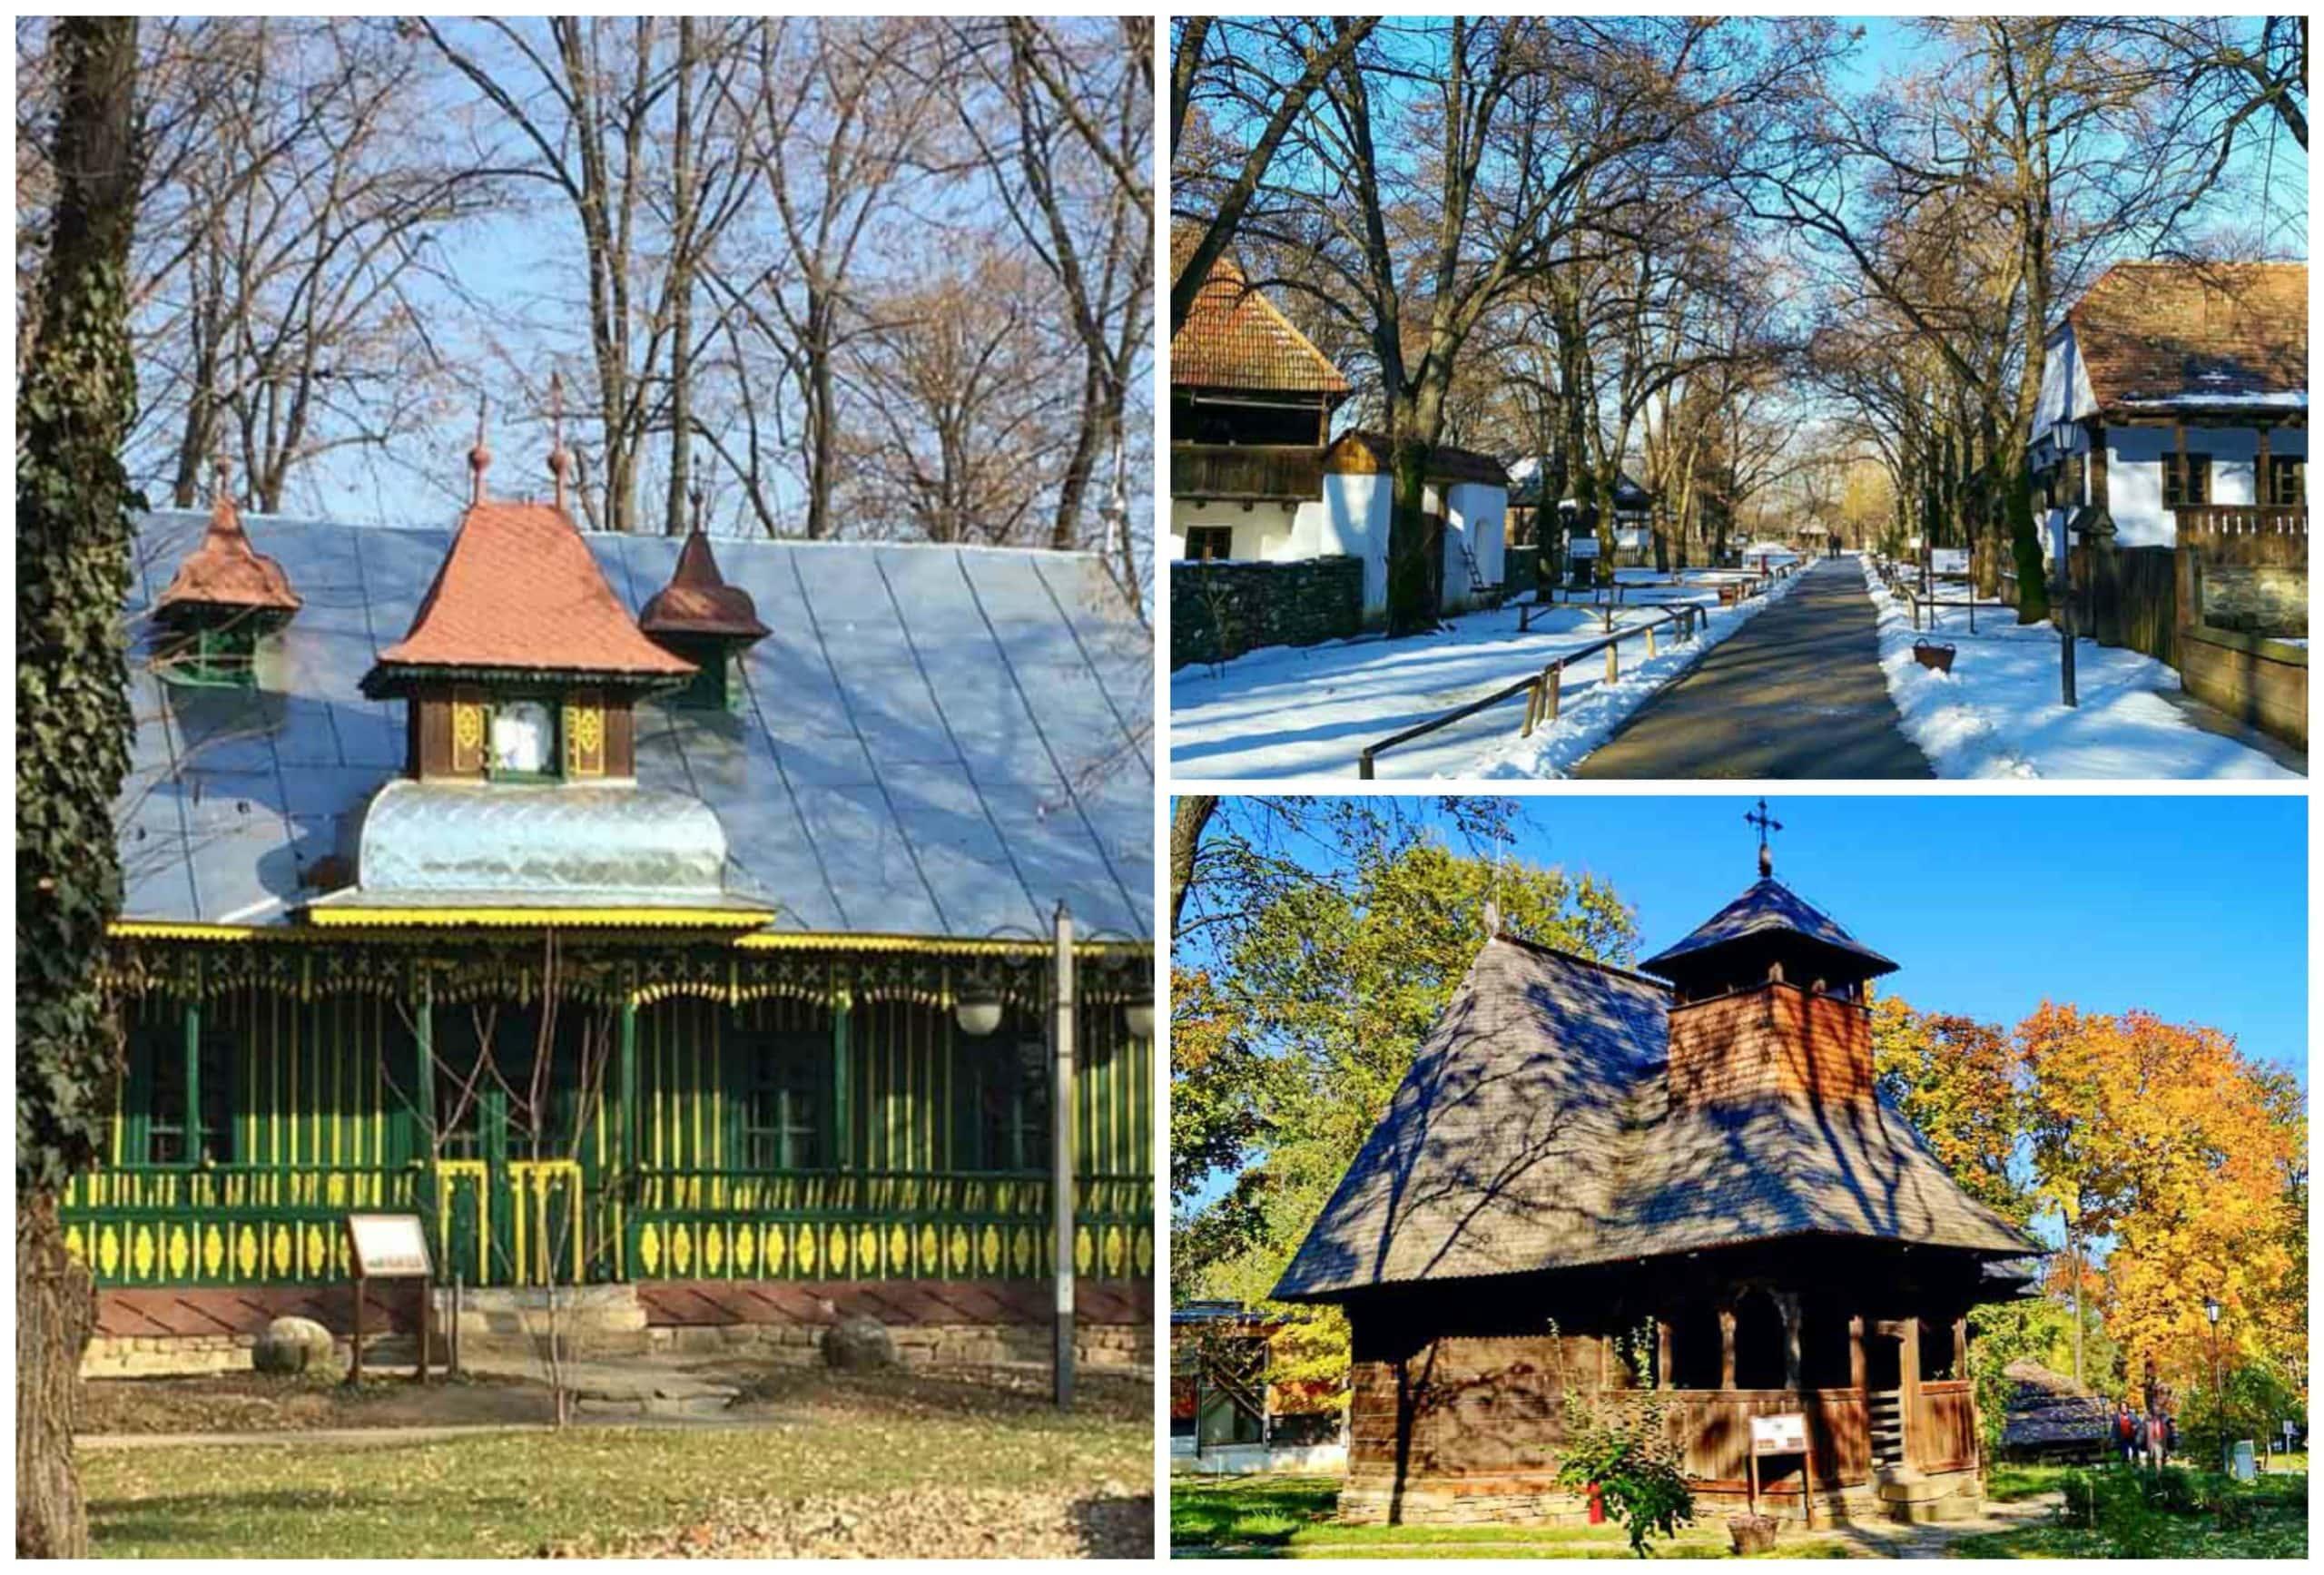 Bucharest Village Museum during different seasons